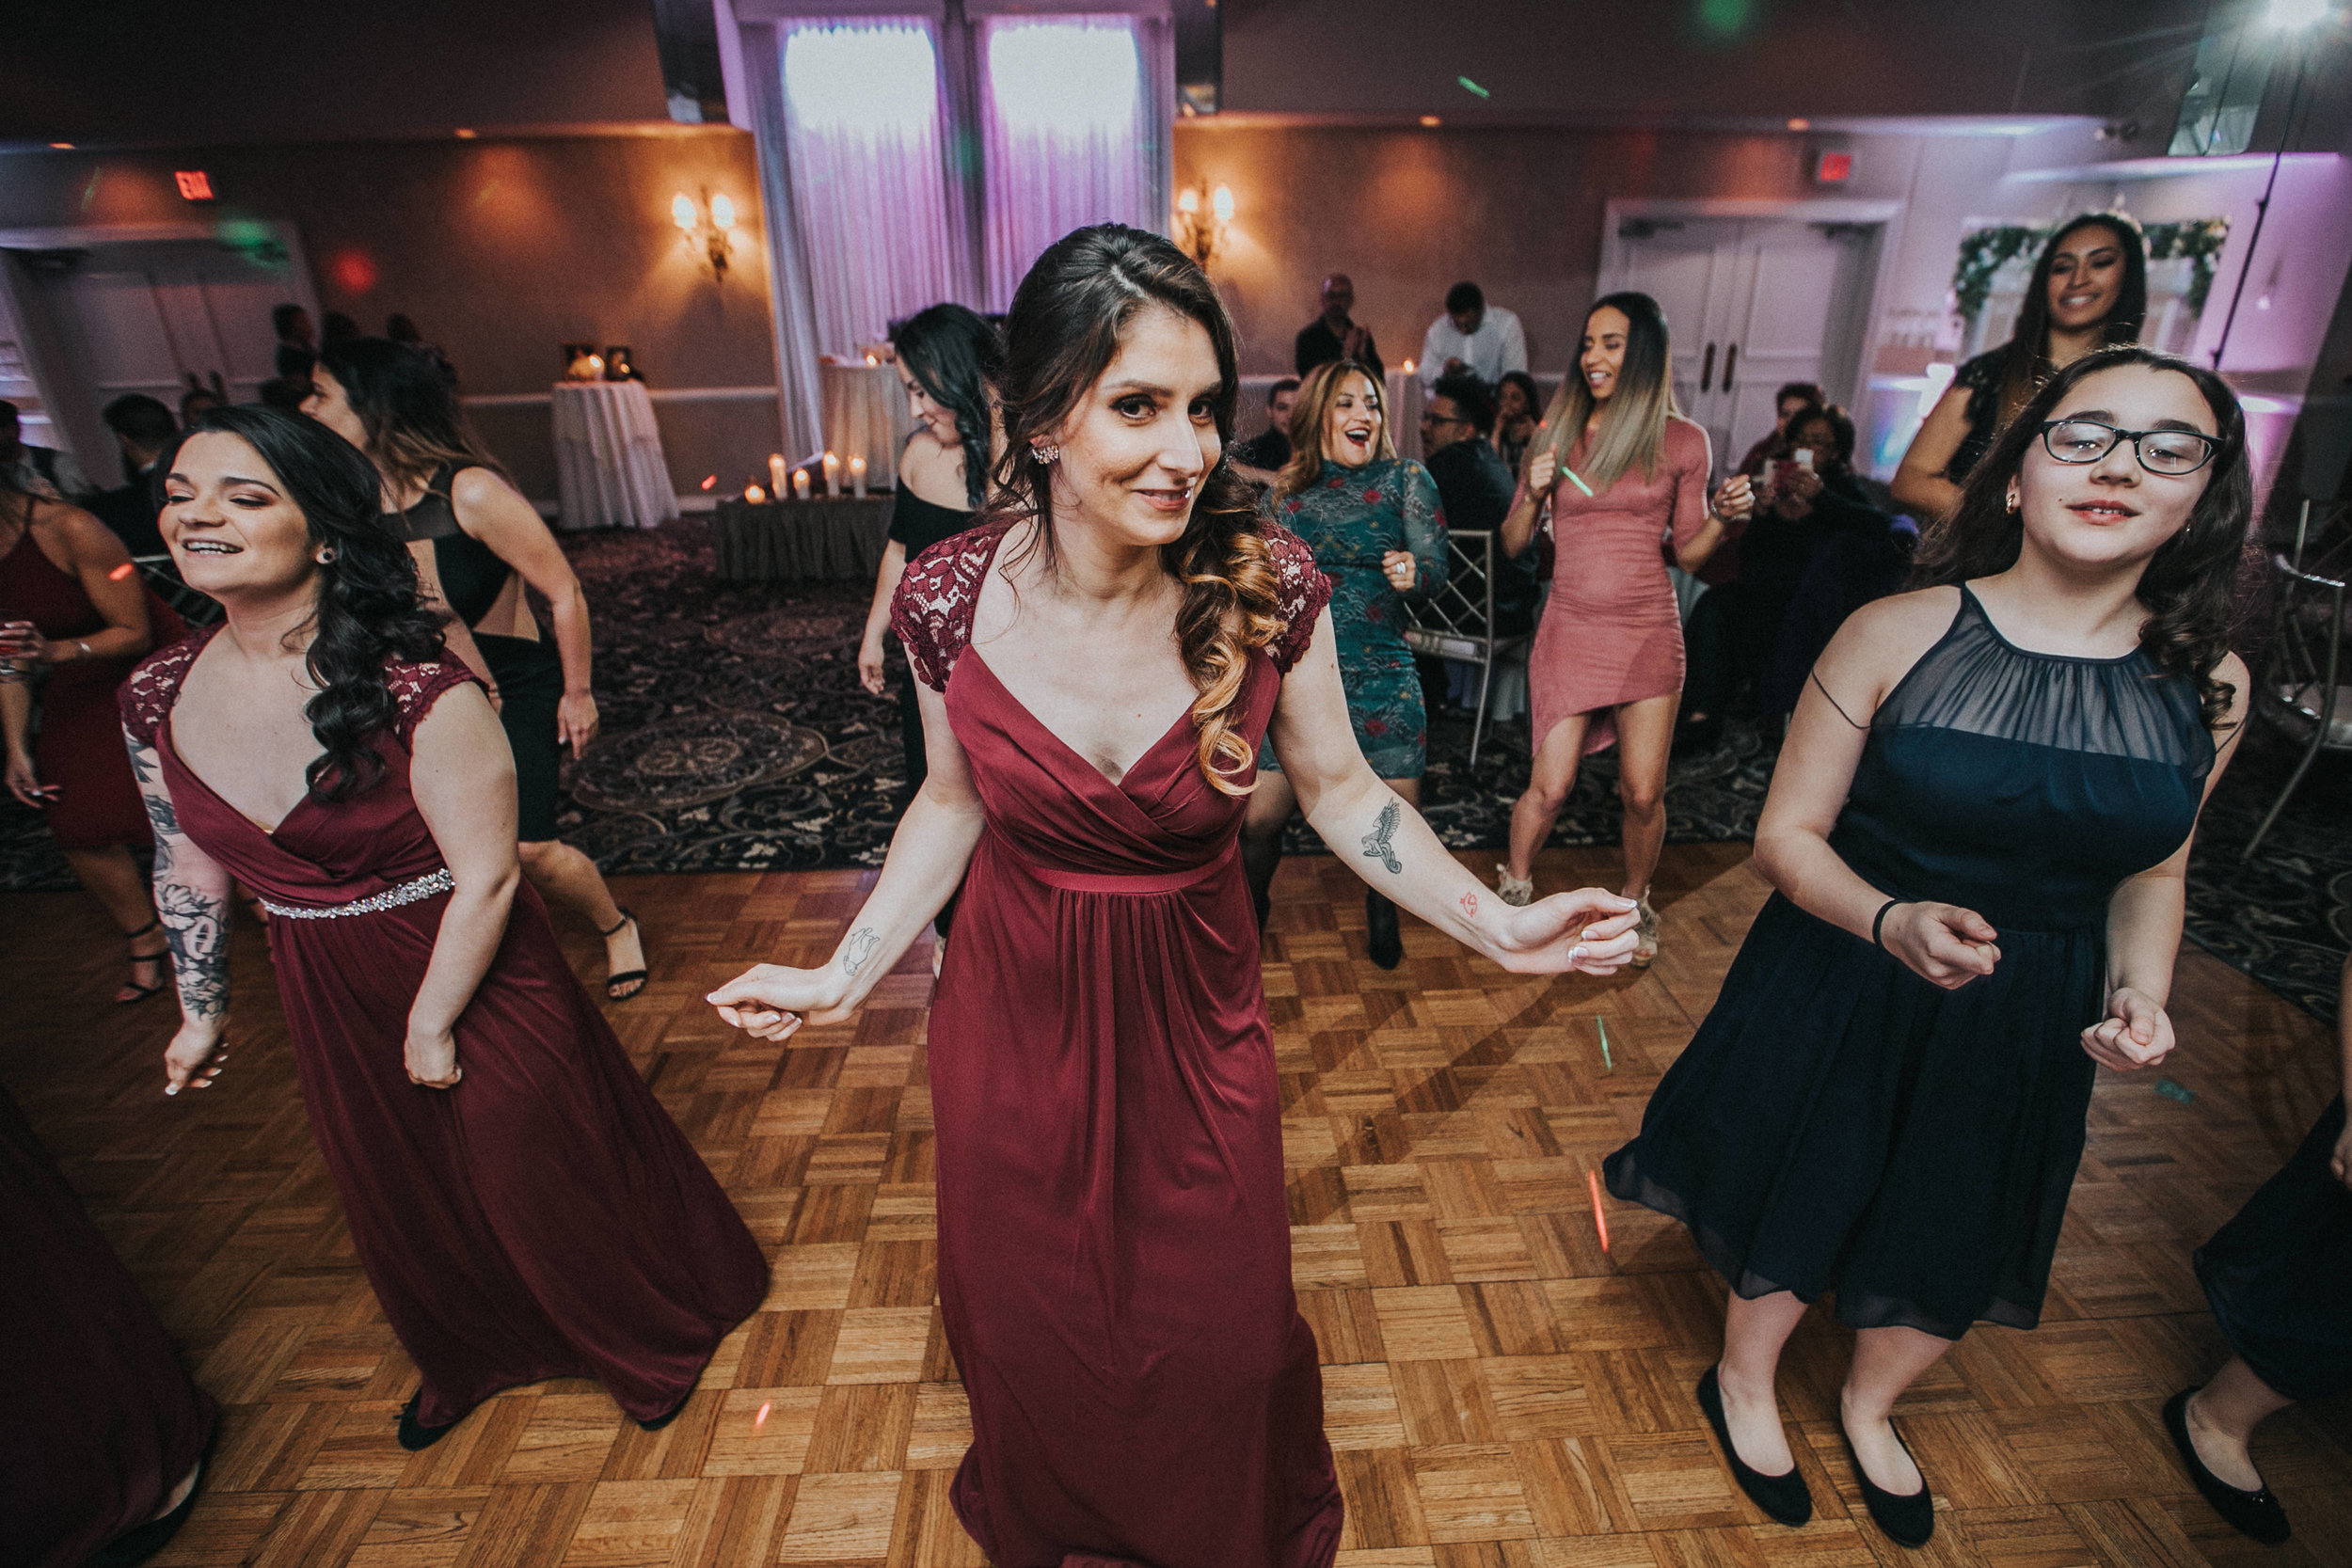 New-Jersey-Wedding-Photographer-ReceptionCenter-Valeria&Mike-Reception (88 of 265).jpg